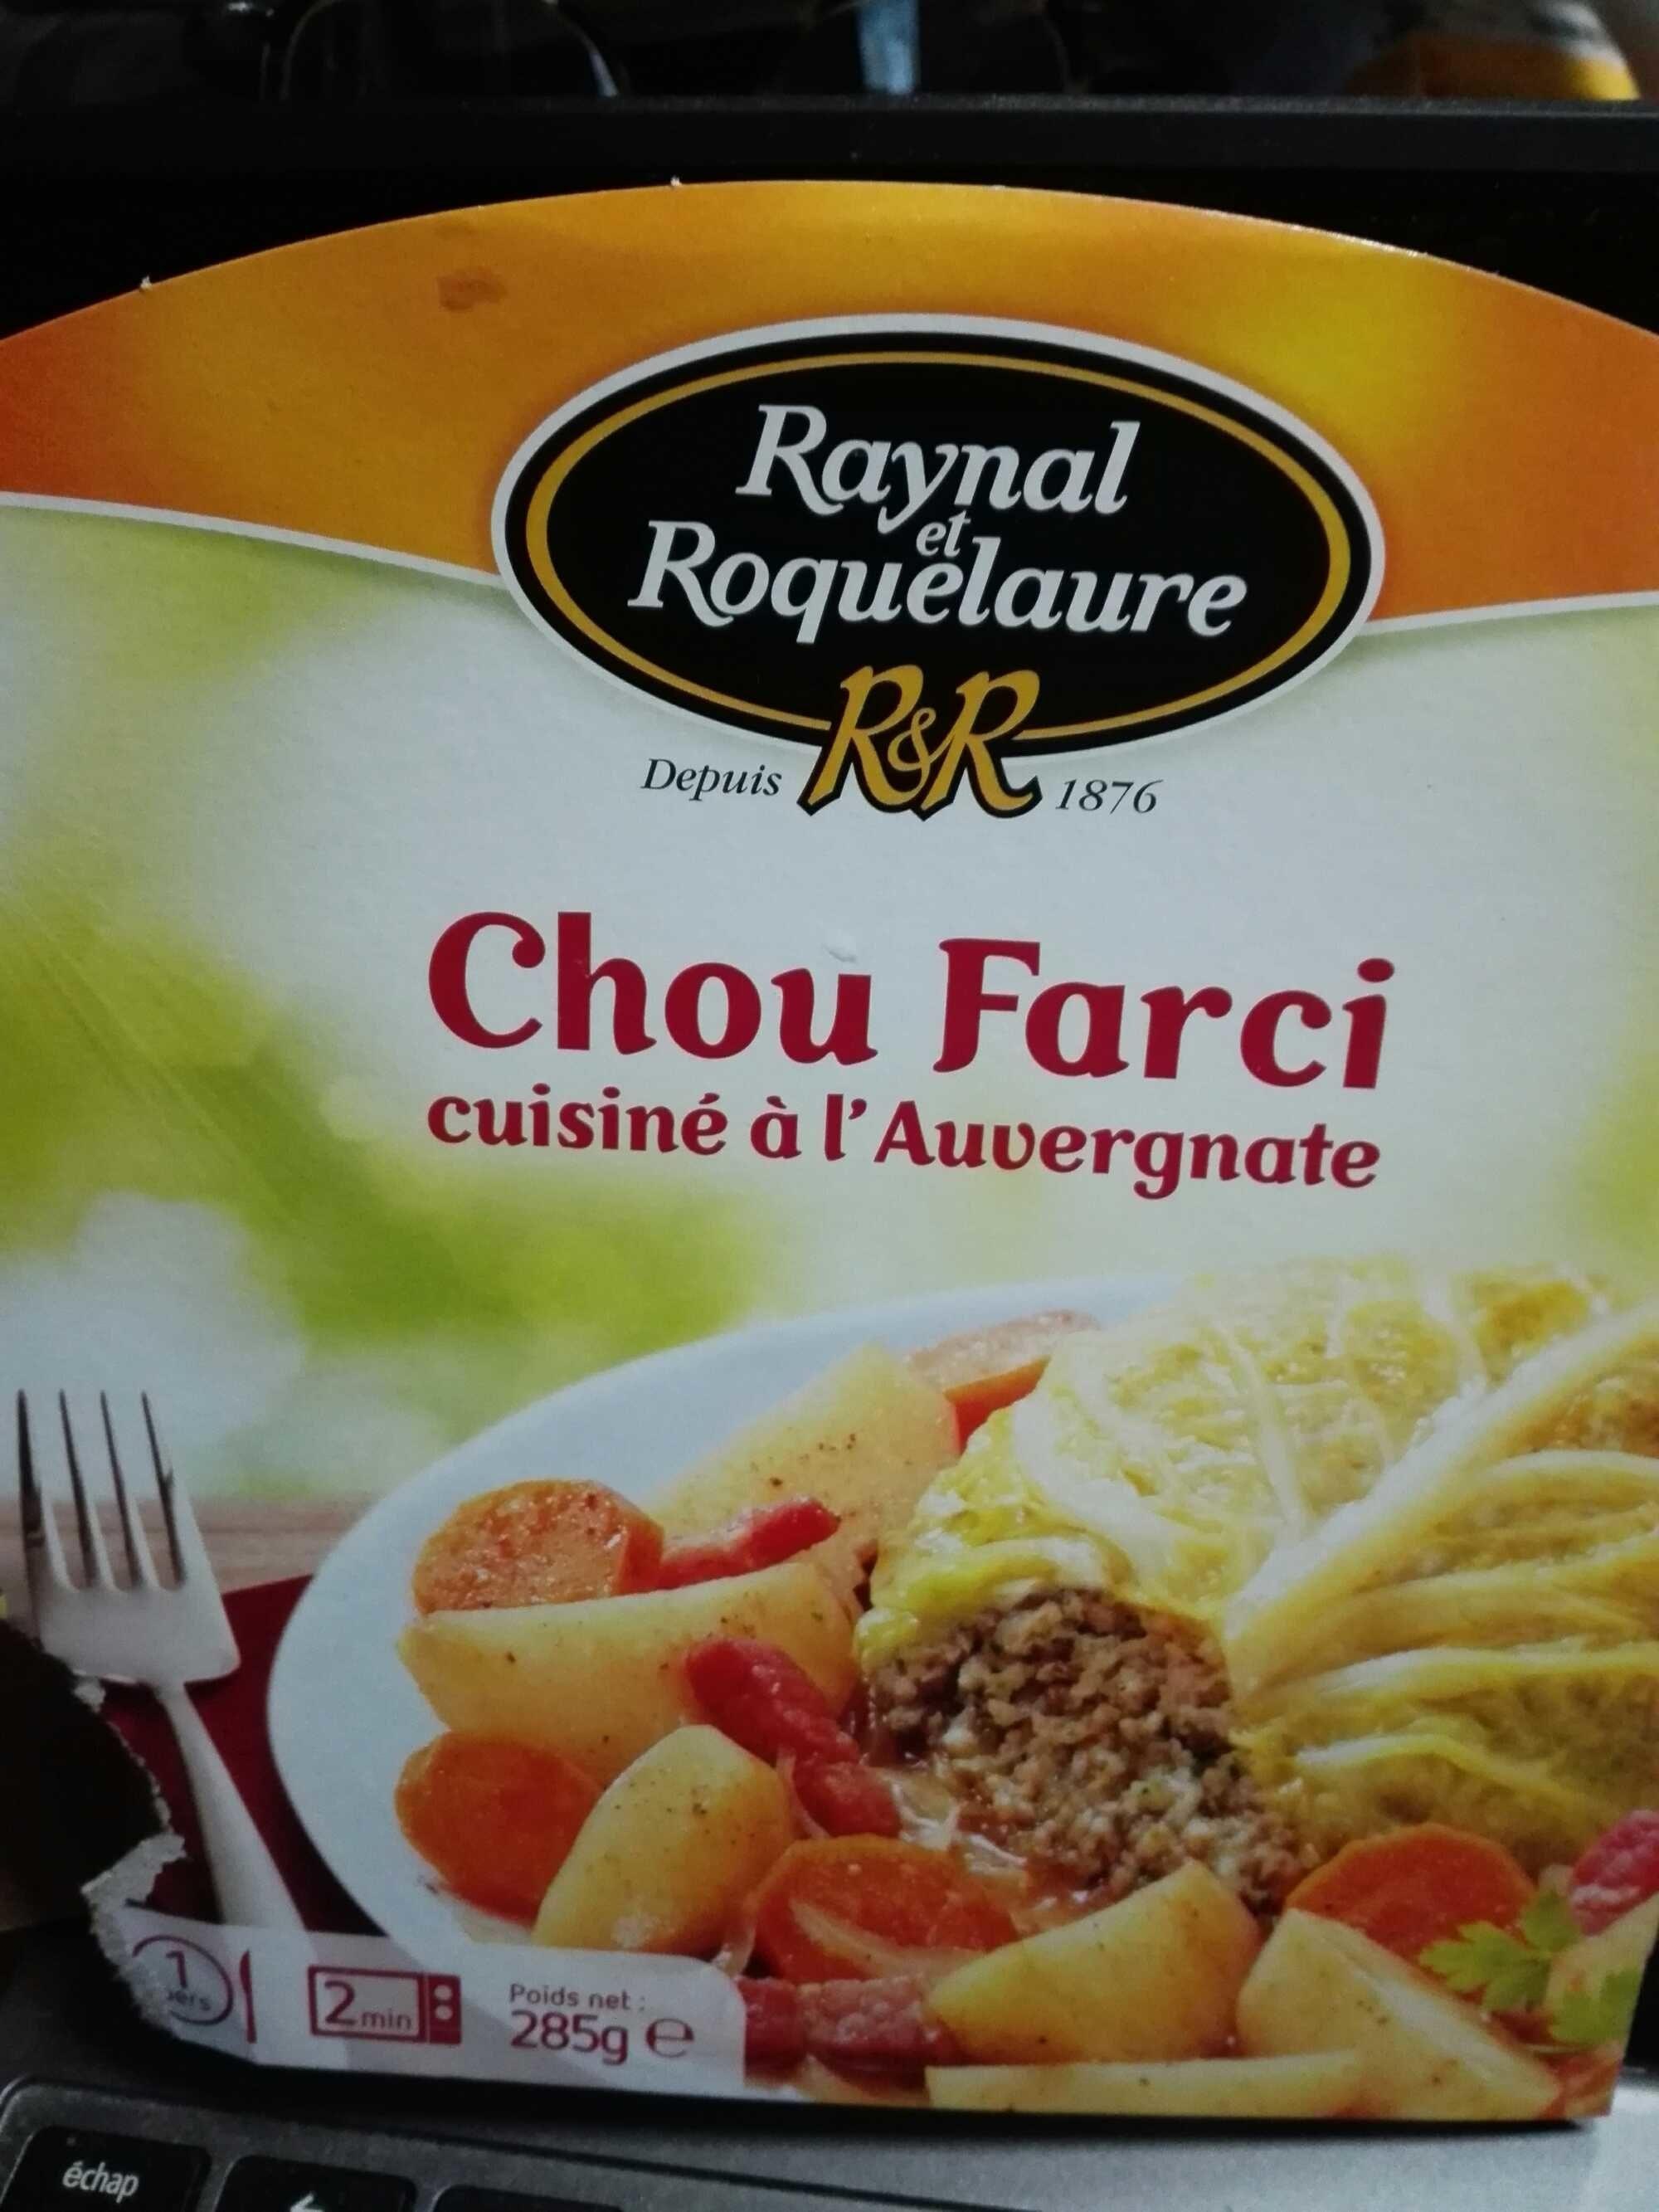 Chou Farci cuisiné à l'Auvergnate - Product